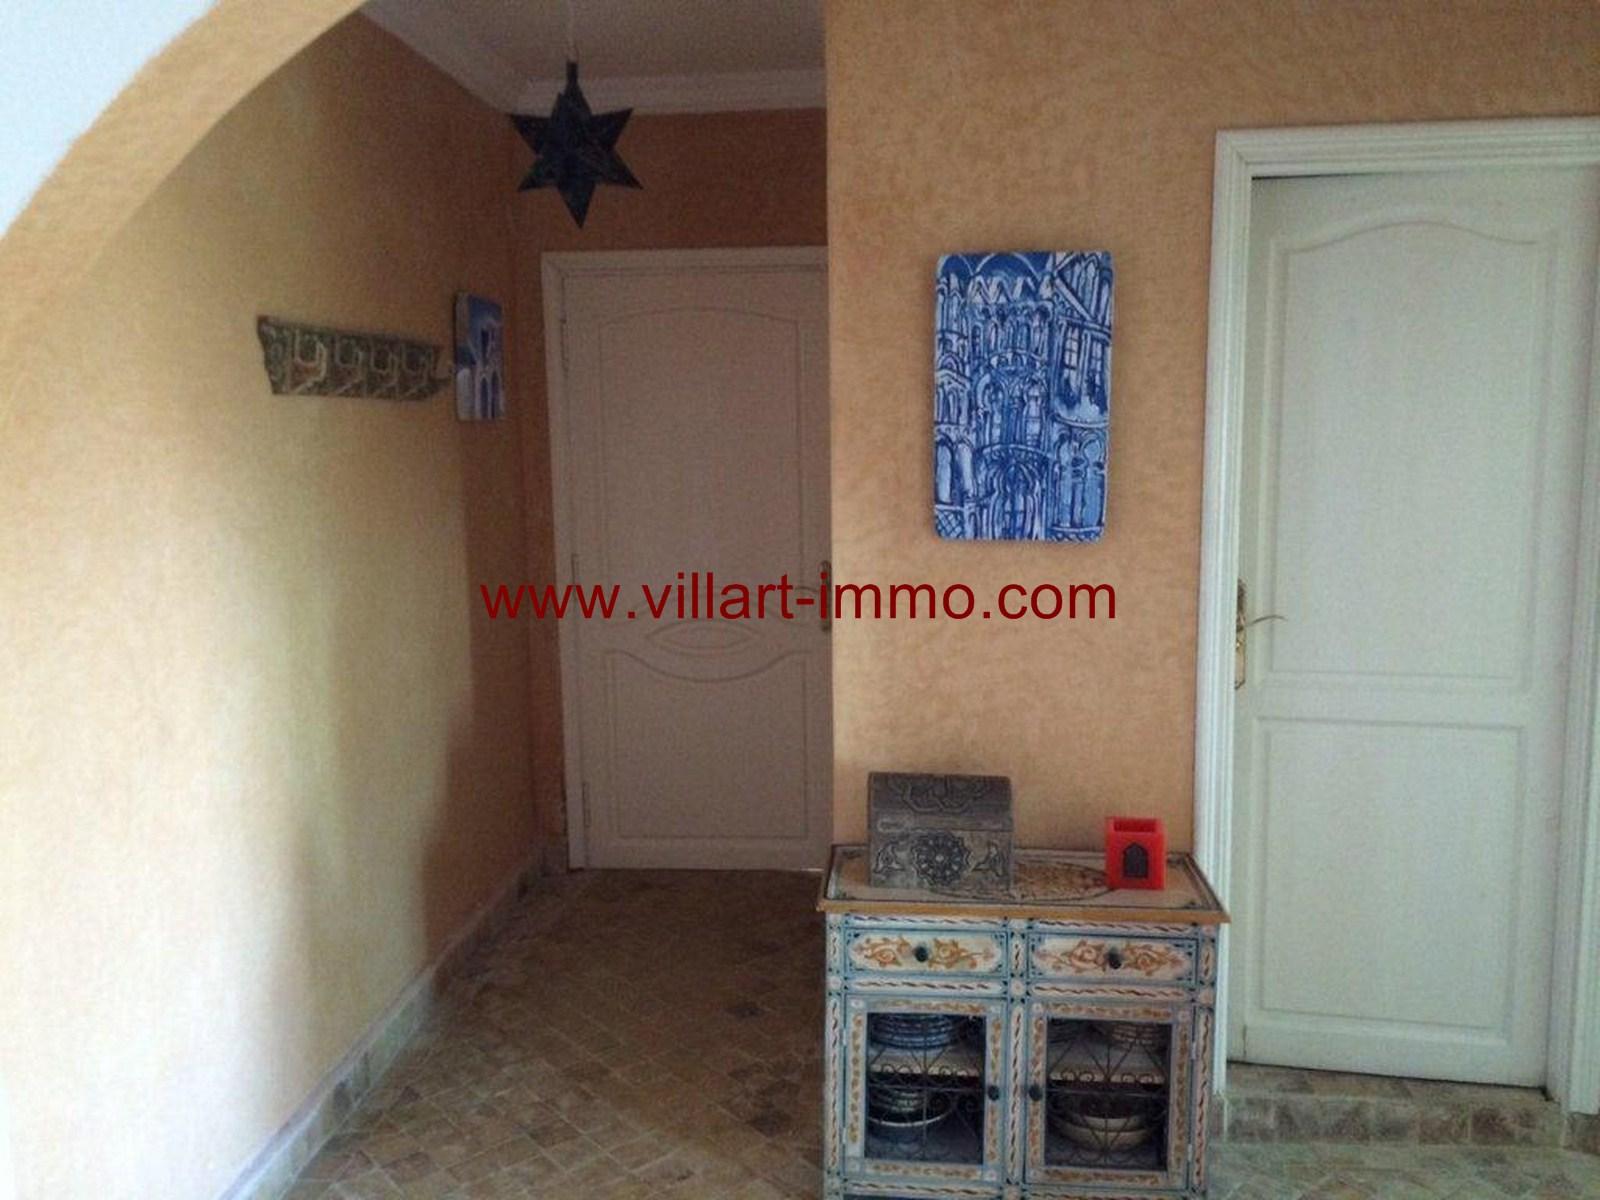 2-Vente-Appartement-Assilah-Entrée-VA511-Villart Immo